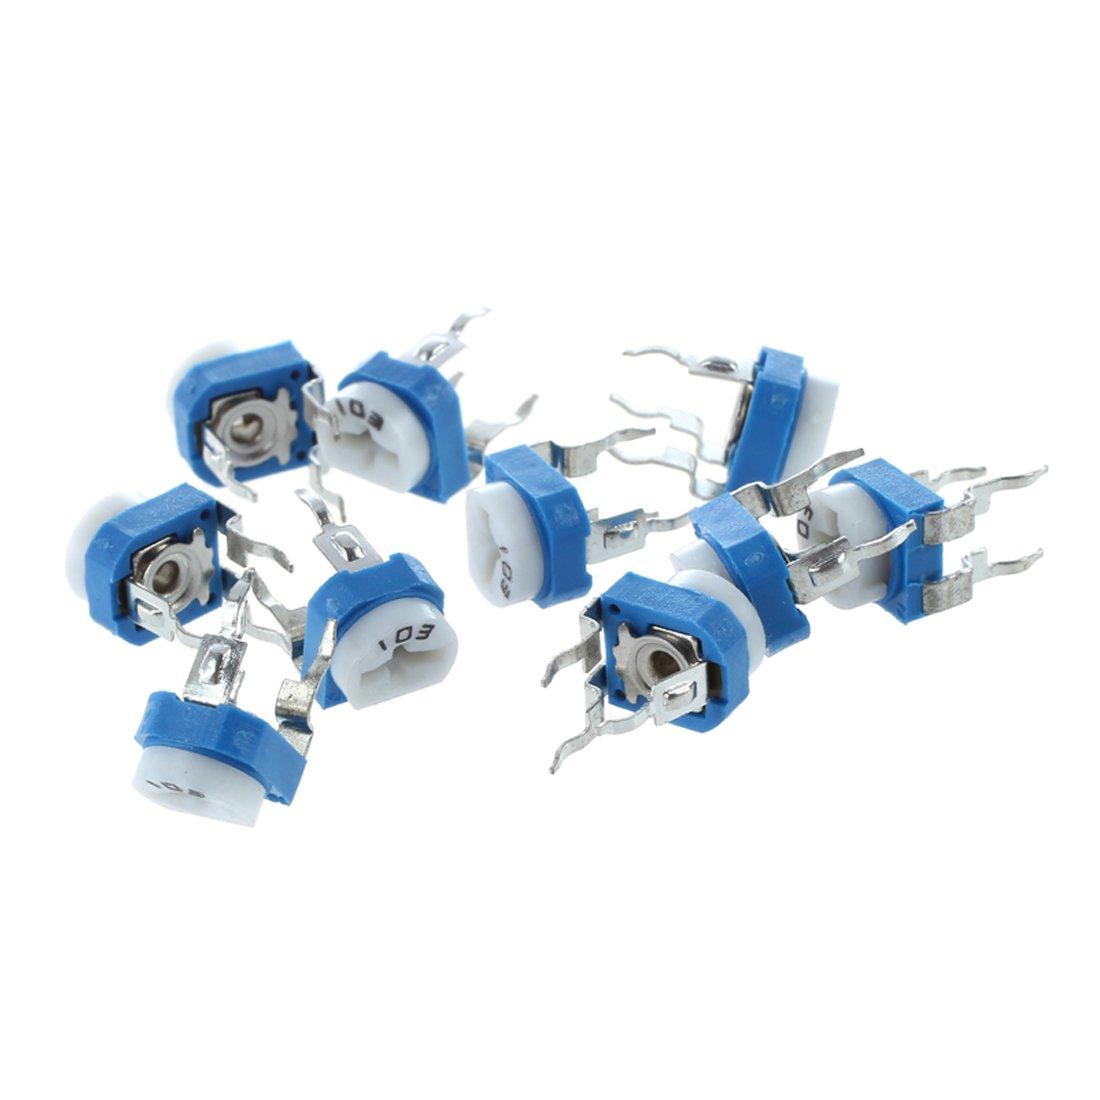 SODIAL(R) 10X 6mm 10k ohm Horizontal Pot Variable Cermet Potentiometer Trimmer Resistor UK